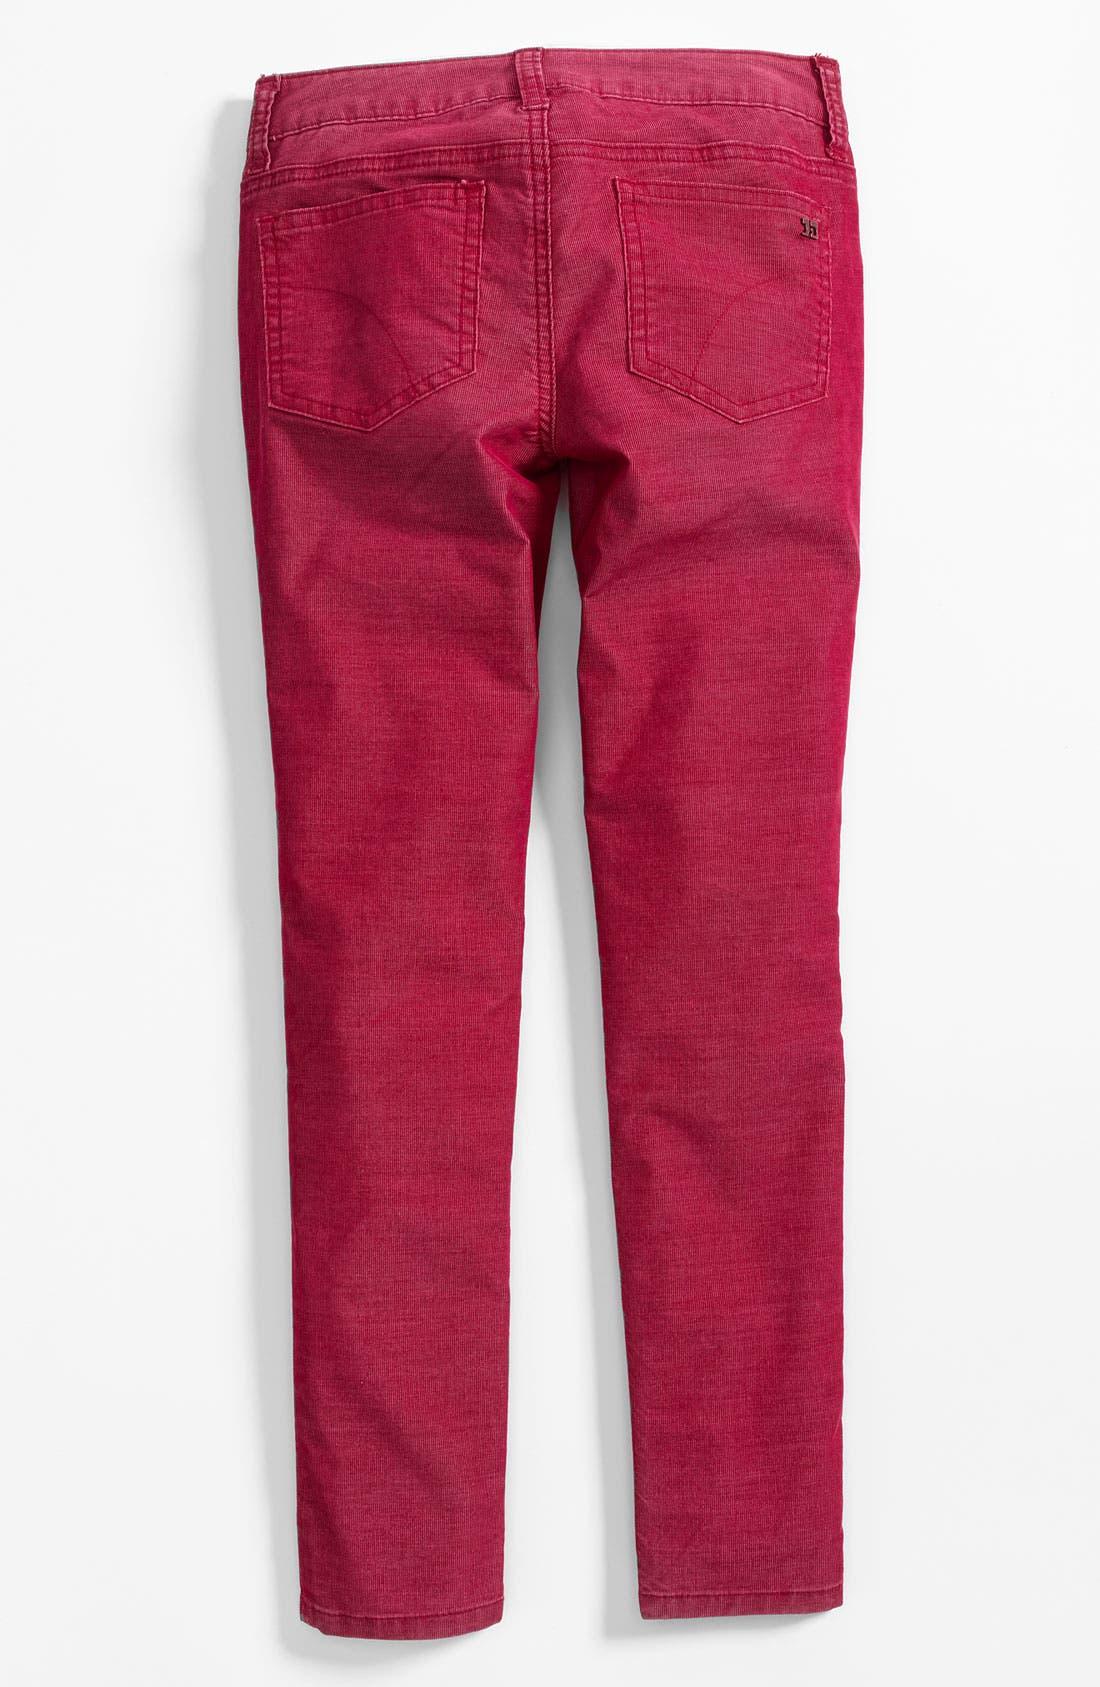 Main Image - Joe's Corduroy Leggings (Big Girls)